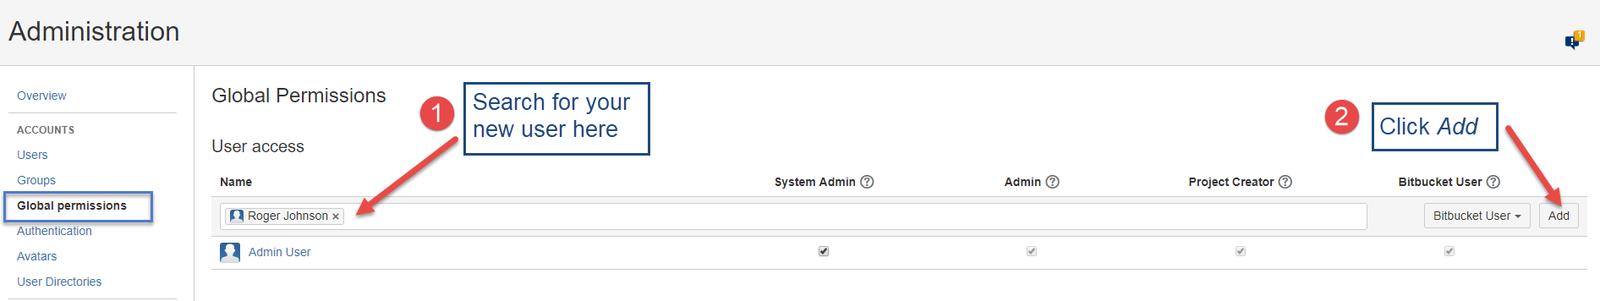 Bitbucket Server Setup - GitPrime Help Center